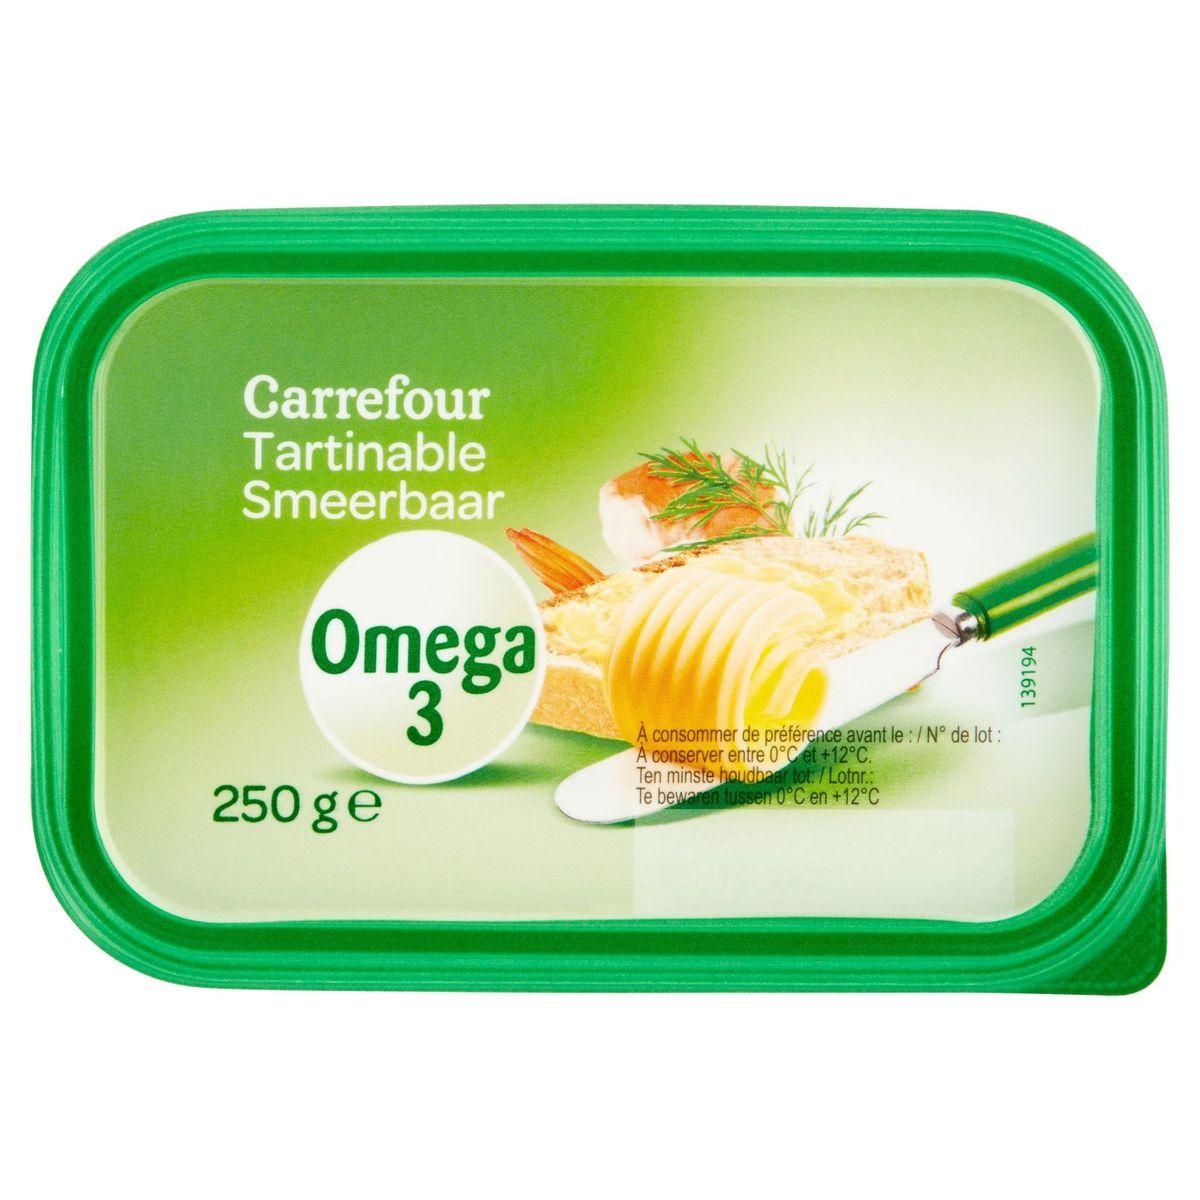 Carrefour Smeerbaar Omega 3 250 g